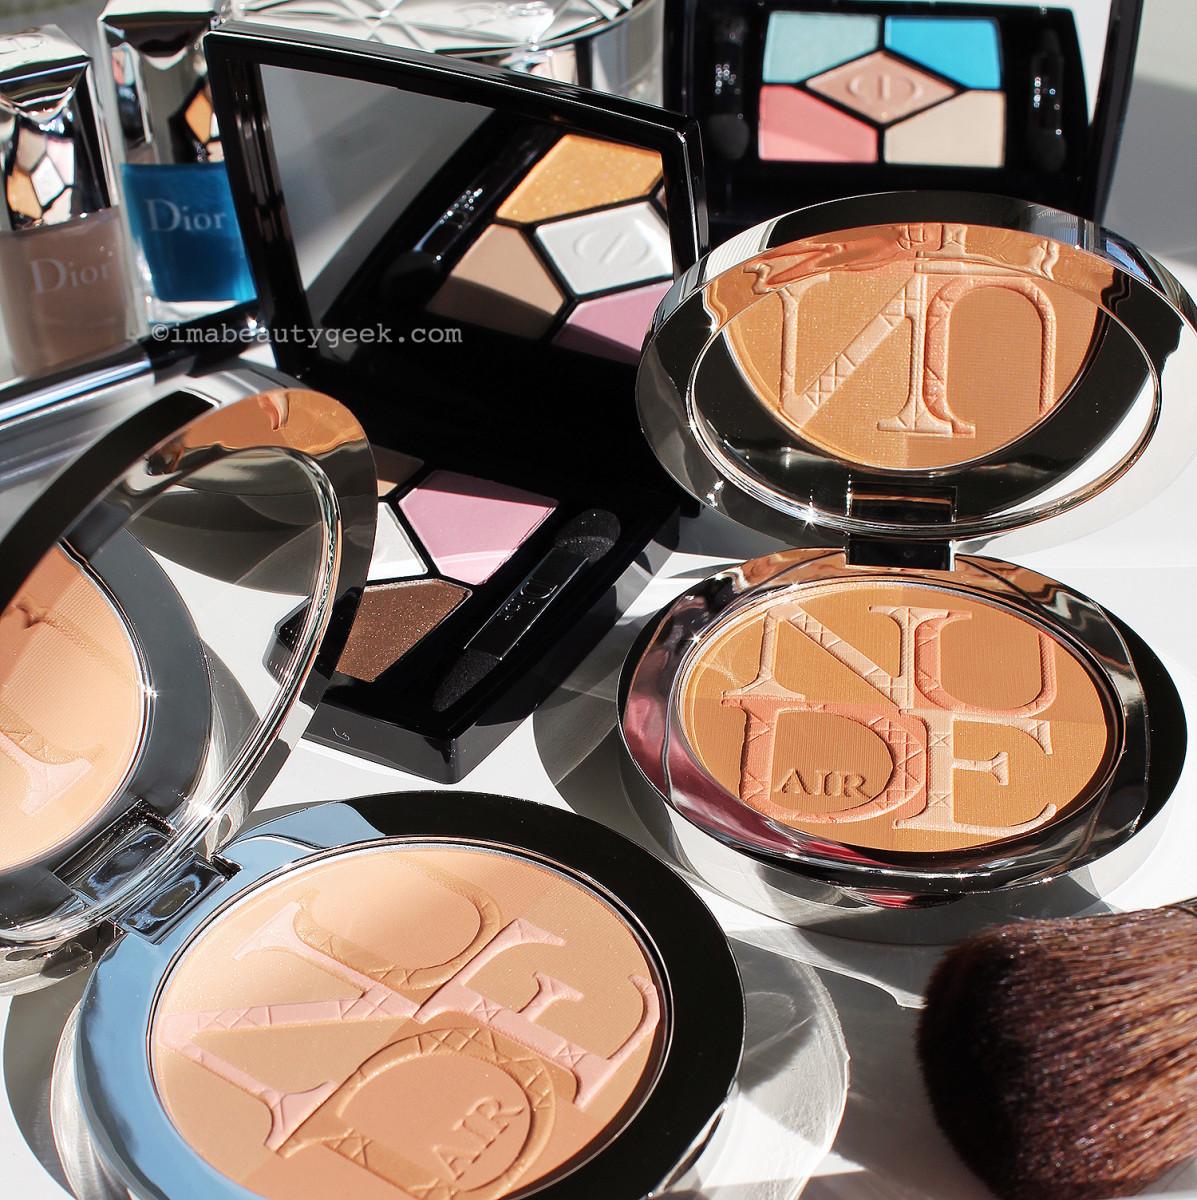 Dior Summer 2016 makeup